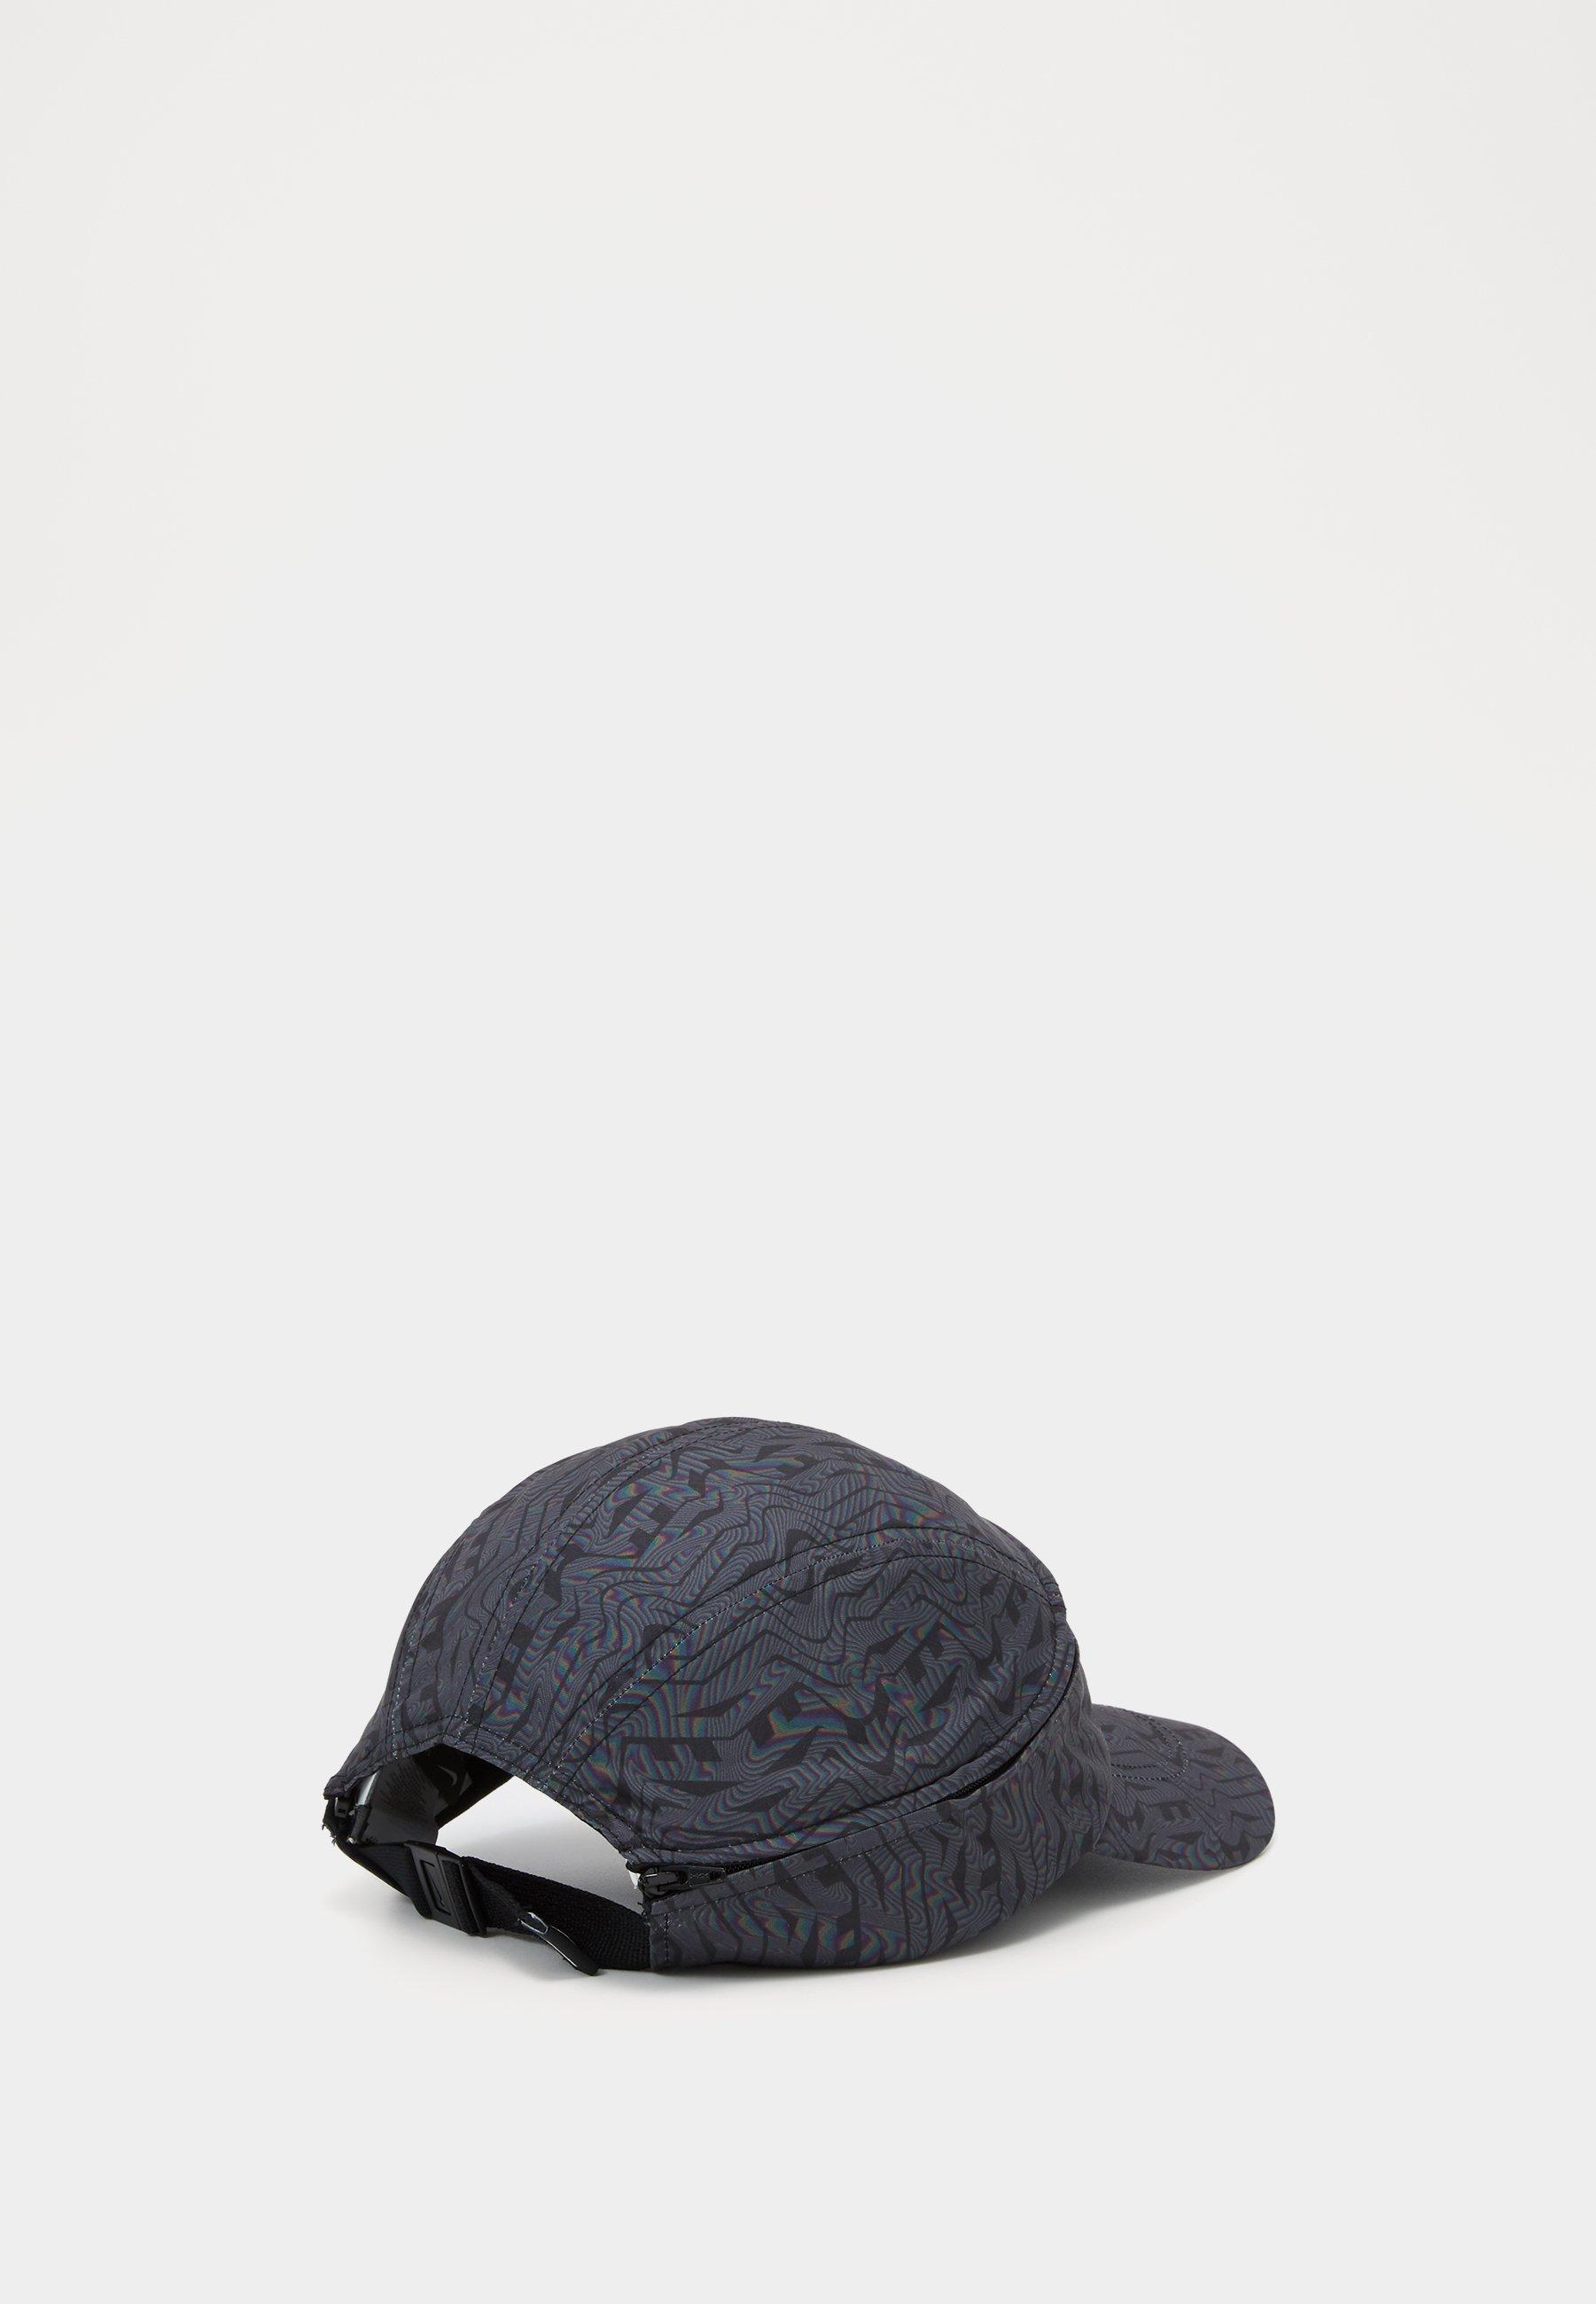 Nike Sportswear Cap - Black/schwarz